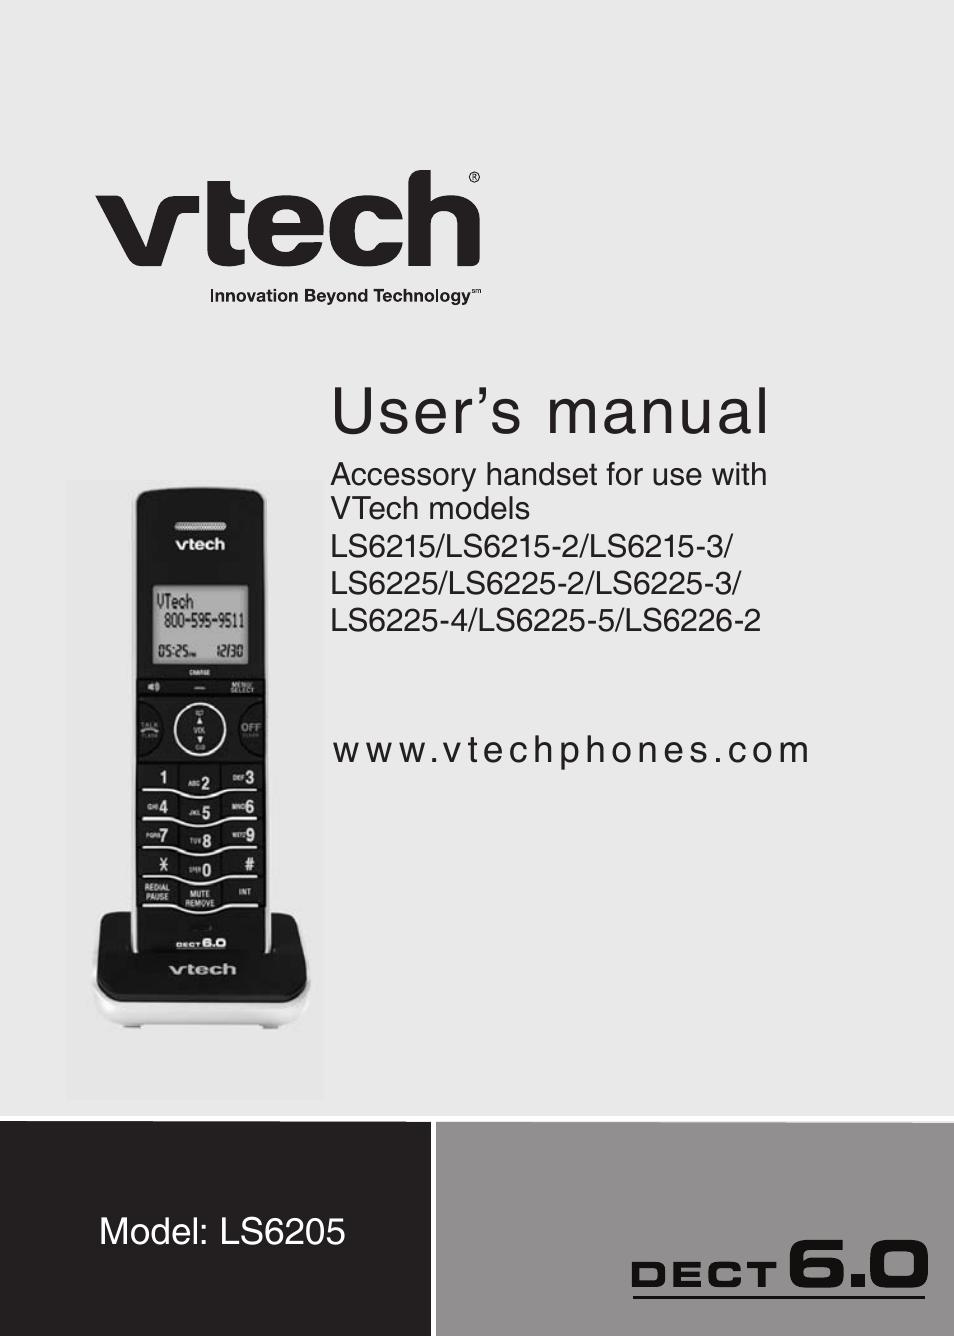 canon d650 user manual